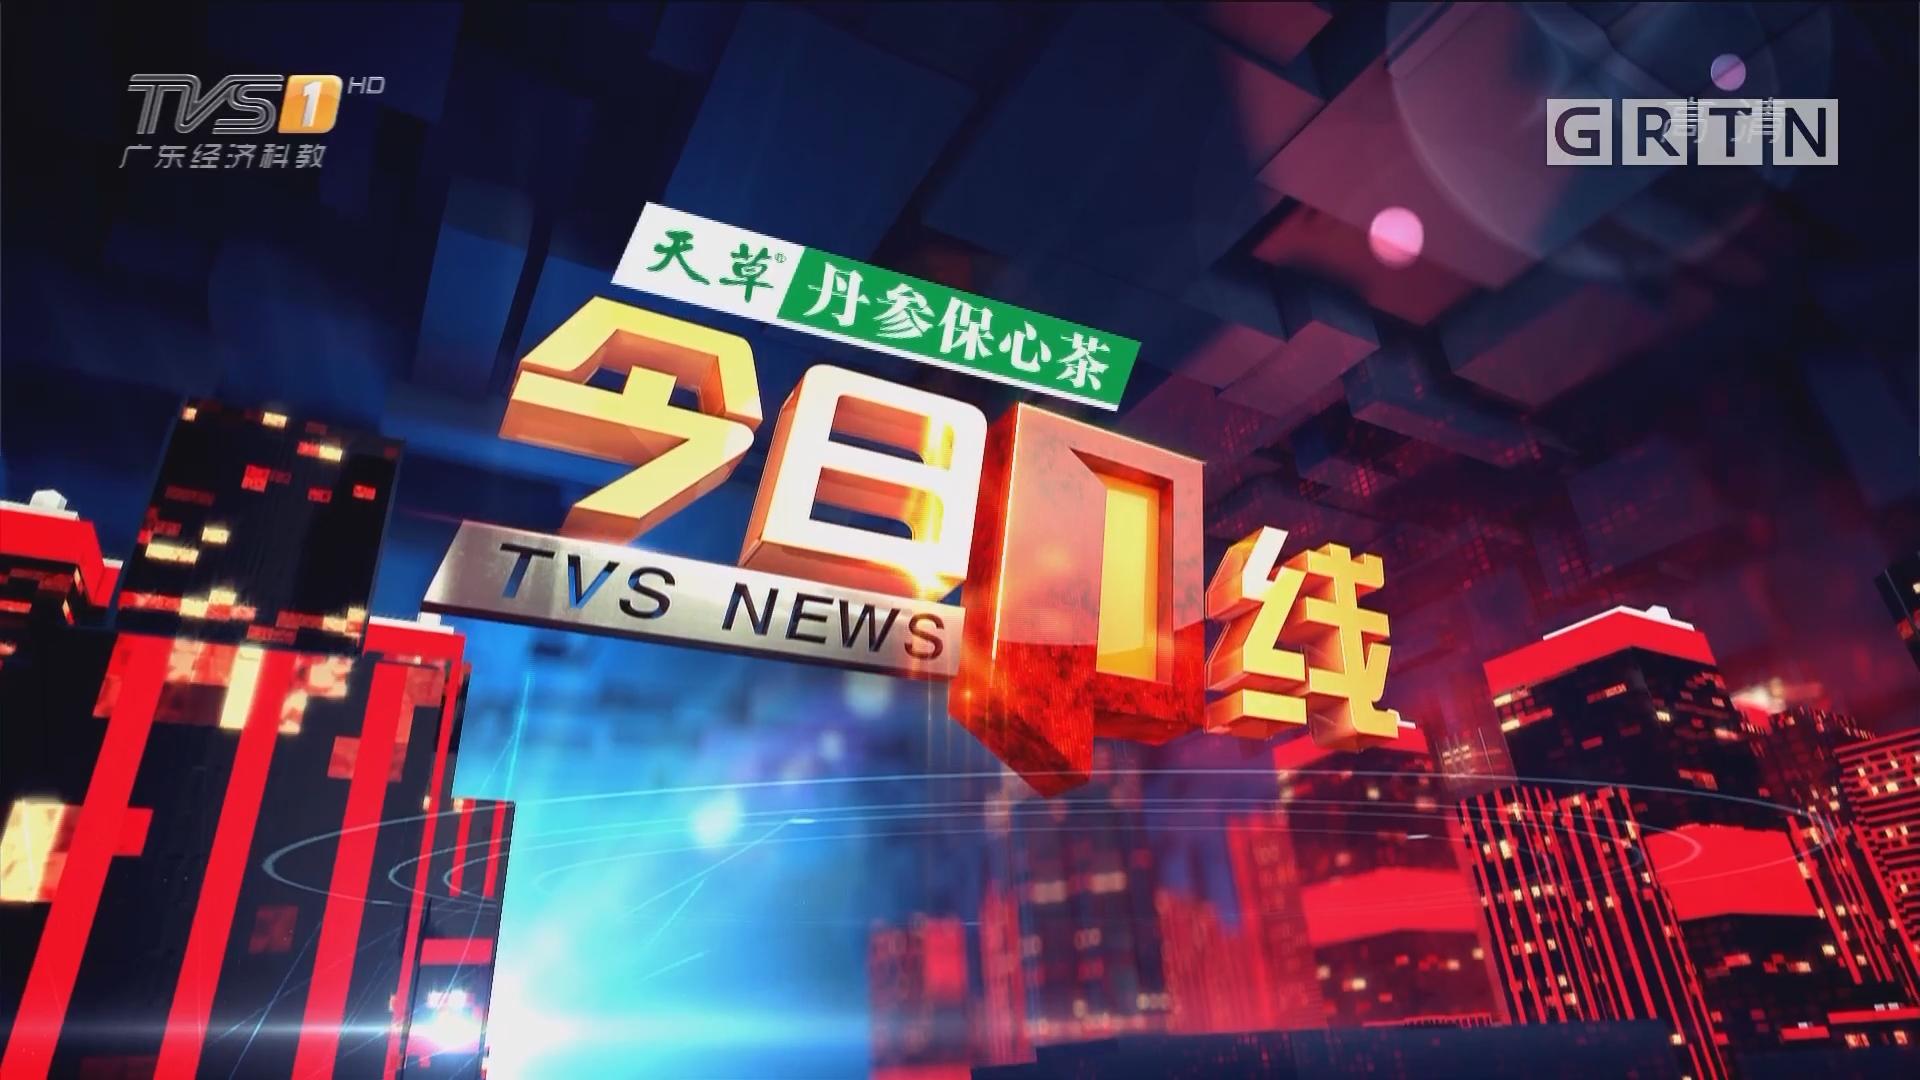 [HD][2018-07-05]今日一线:广州花都:公交疑失控闯祸 撞毁电柜追尾小车